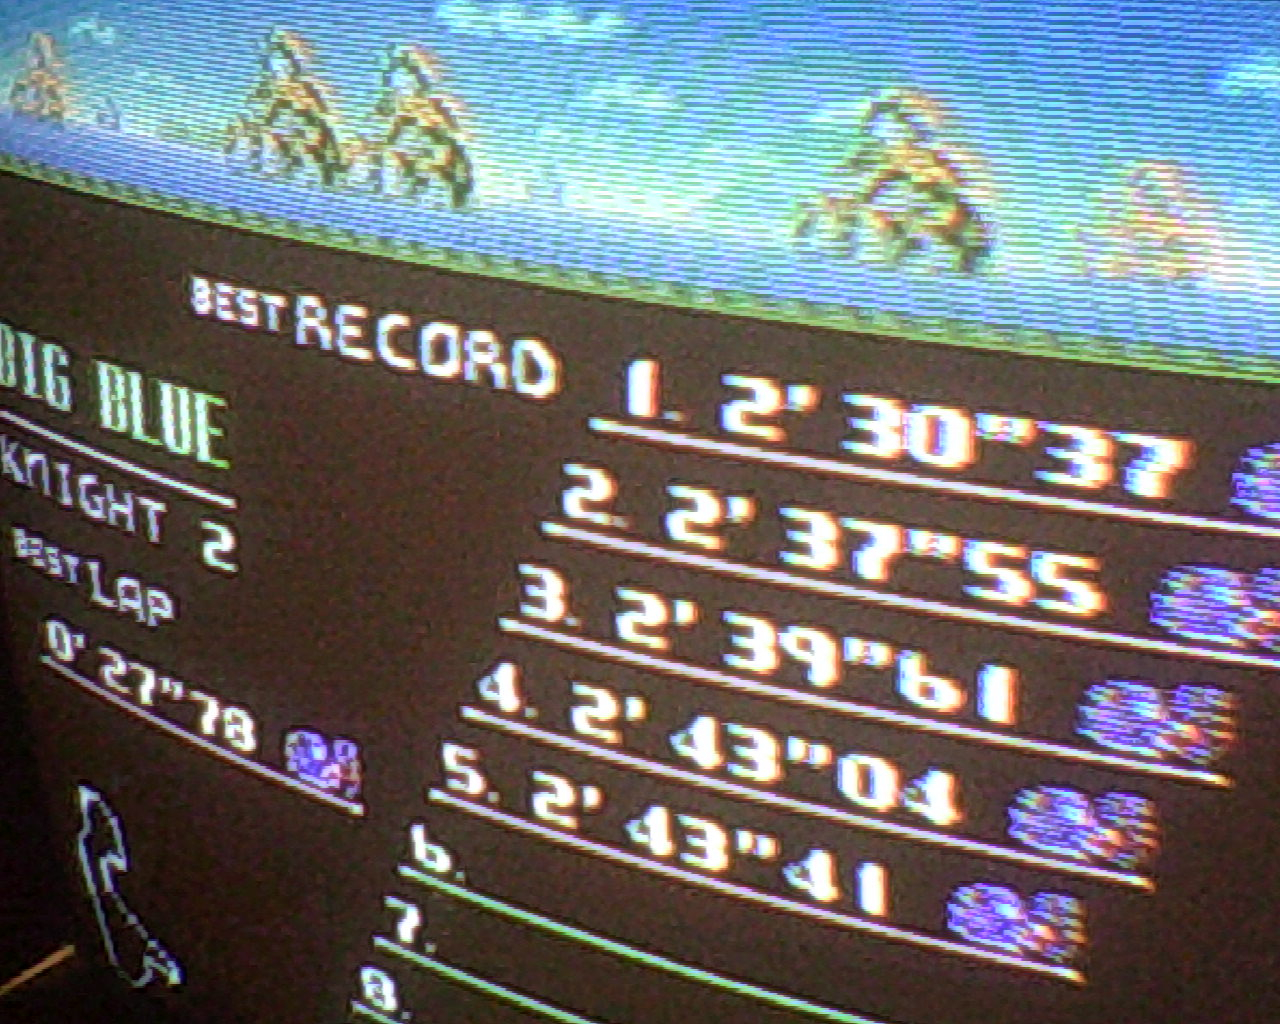 DuckGWR: F-Zero: Big Blue [Beginner] (SNES/Super Famicom) 0:02:30.37 points on 2014-12-22 18:22:49